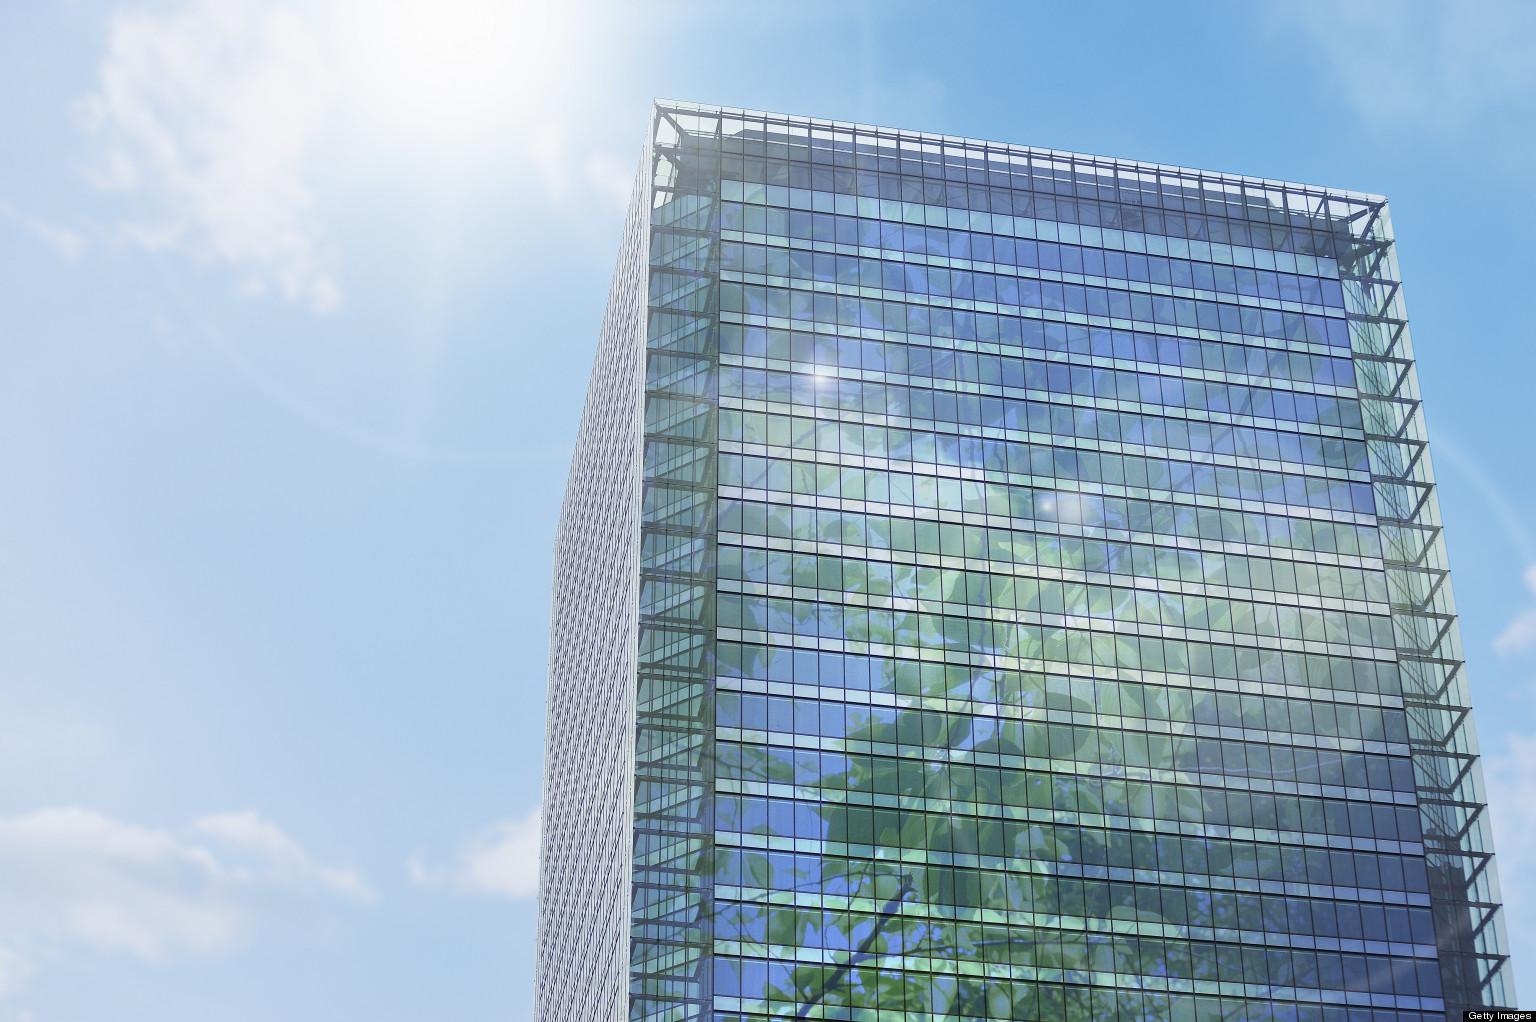 Why obama should design green building certifications - Green design ...